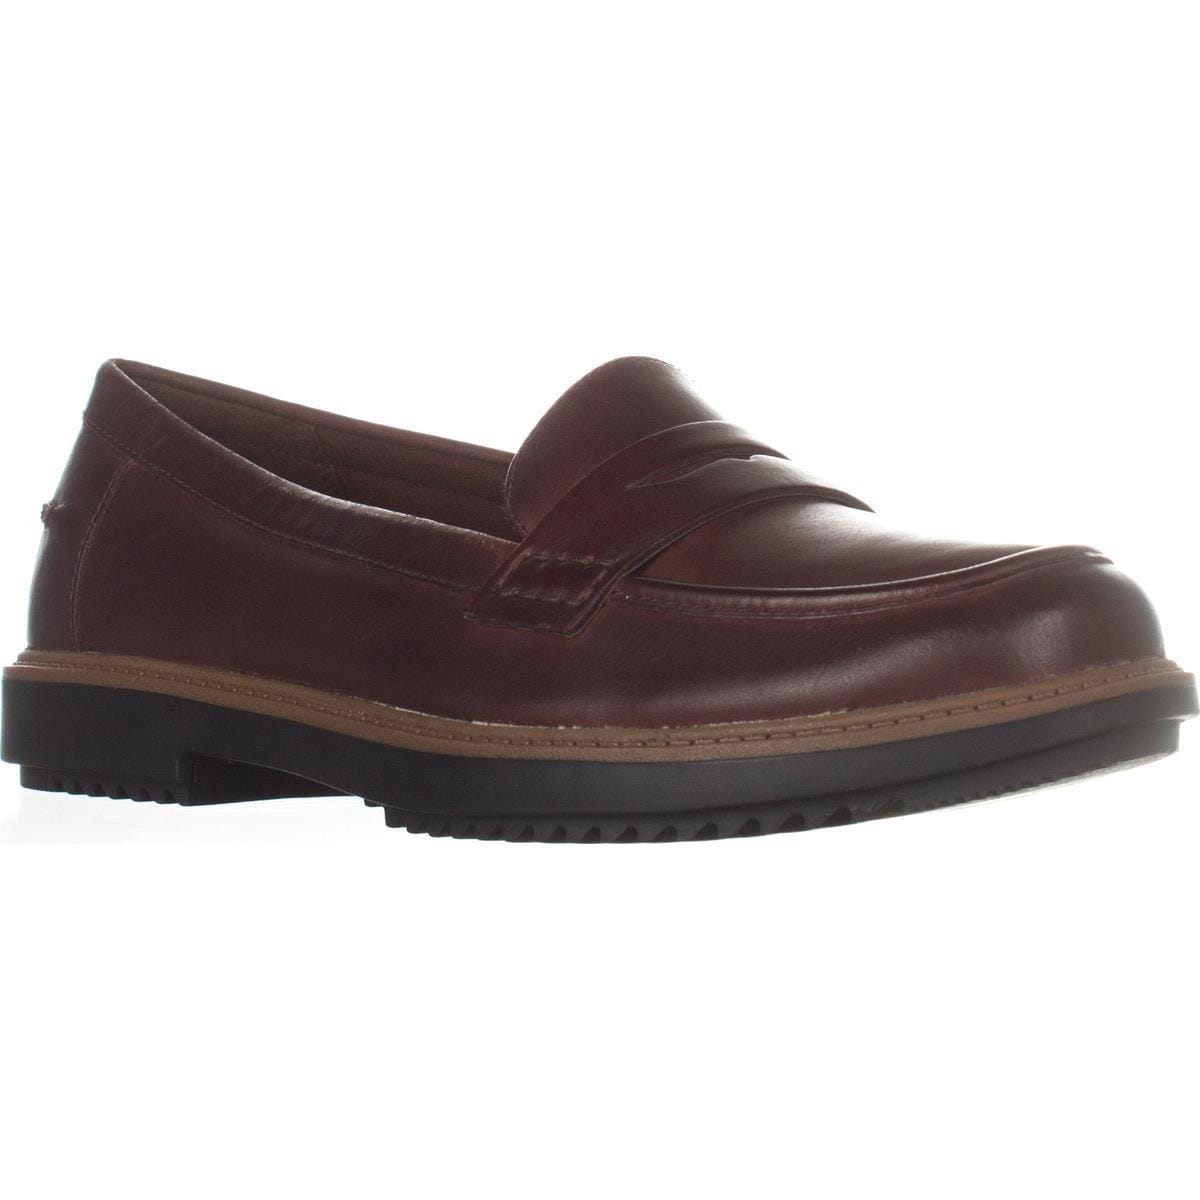 eeb26f7cacc Shop Clarks Raisie Eletta Comfort Penny Loafers